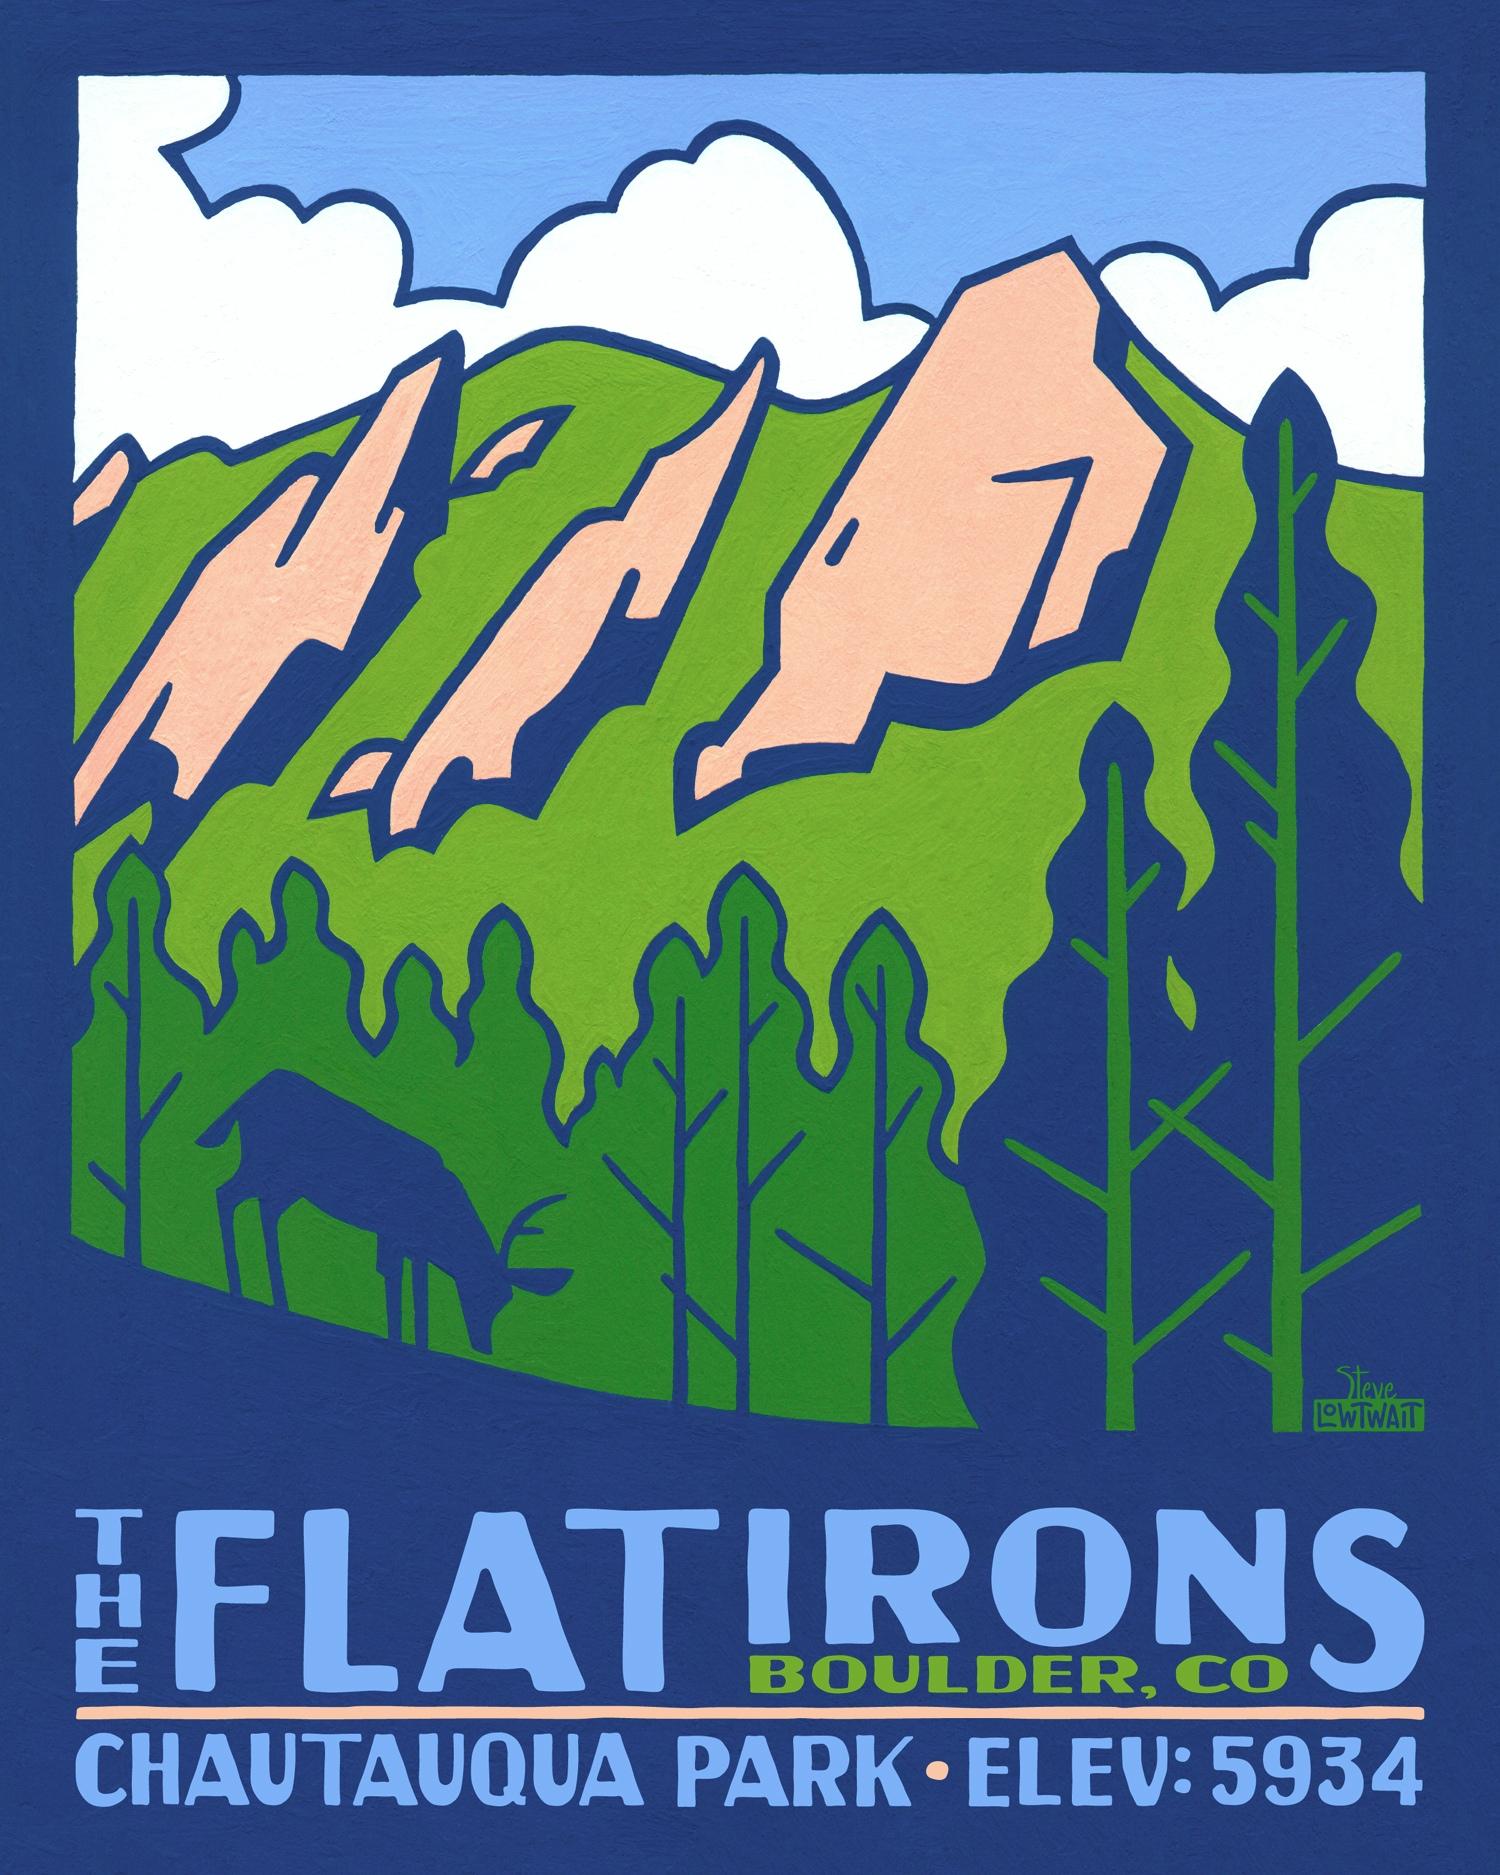 The Flatirons - Boulder, Colorado •  Buy